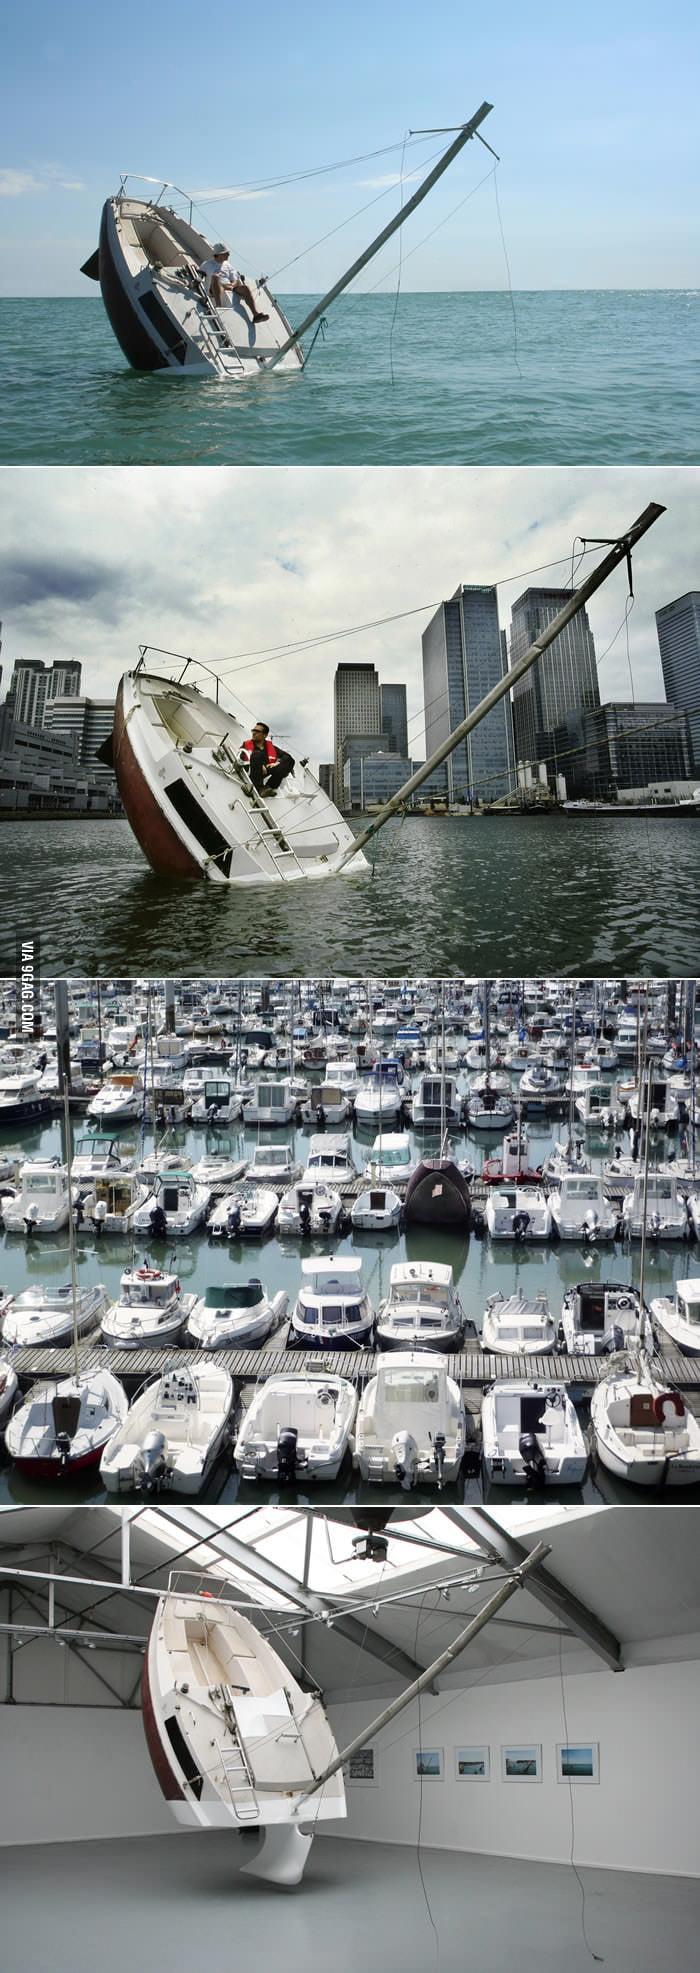 I should buy a troll boat.